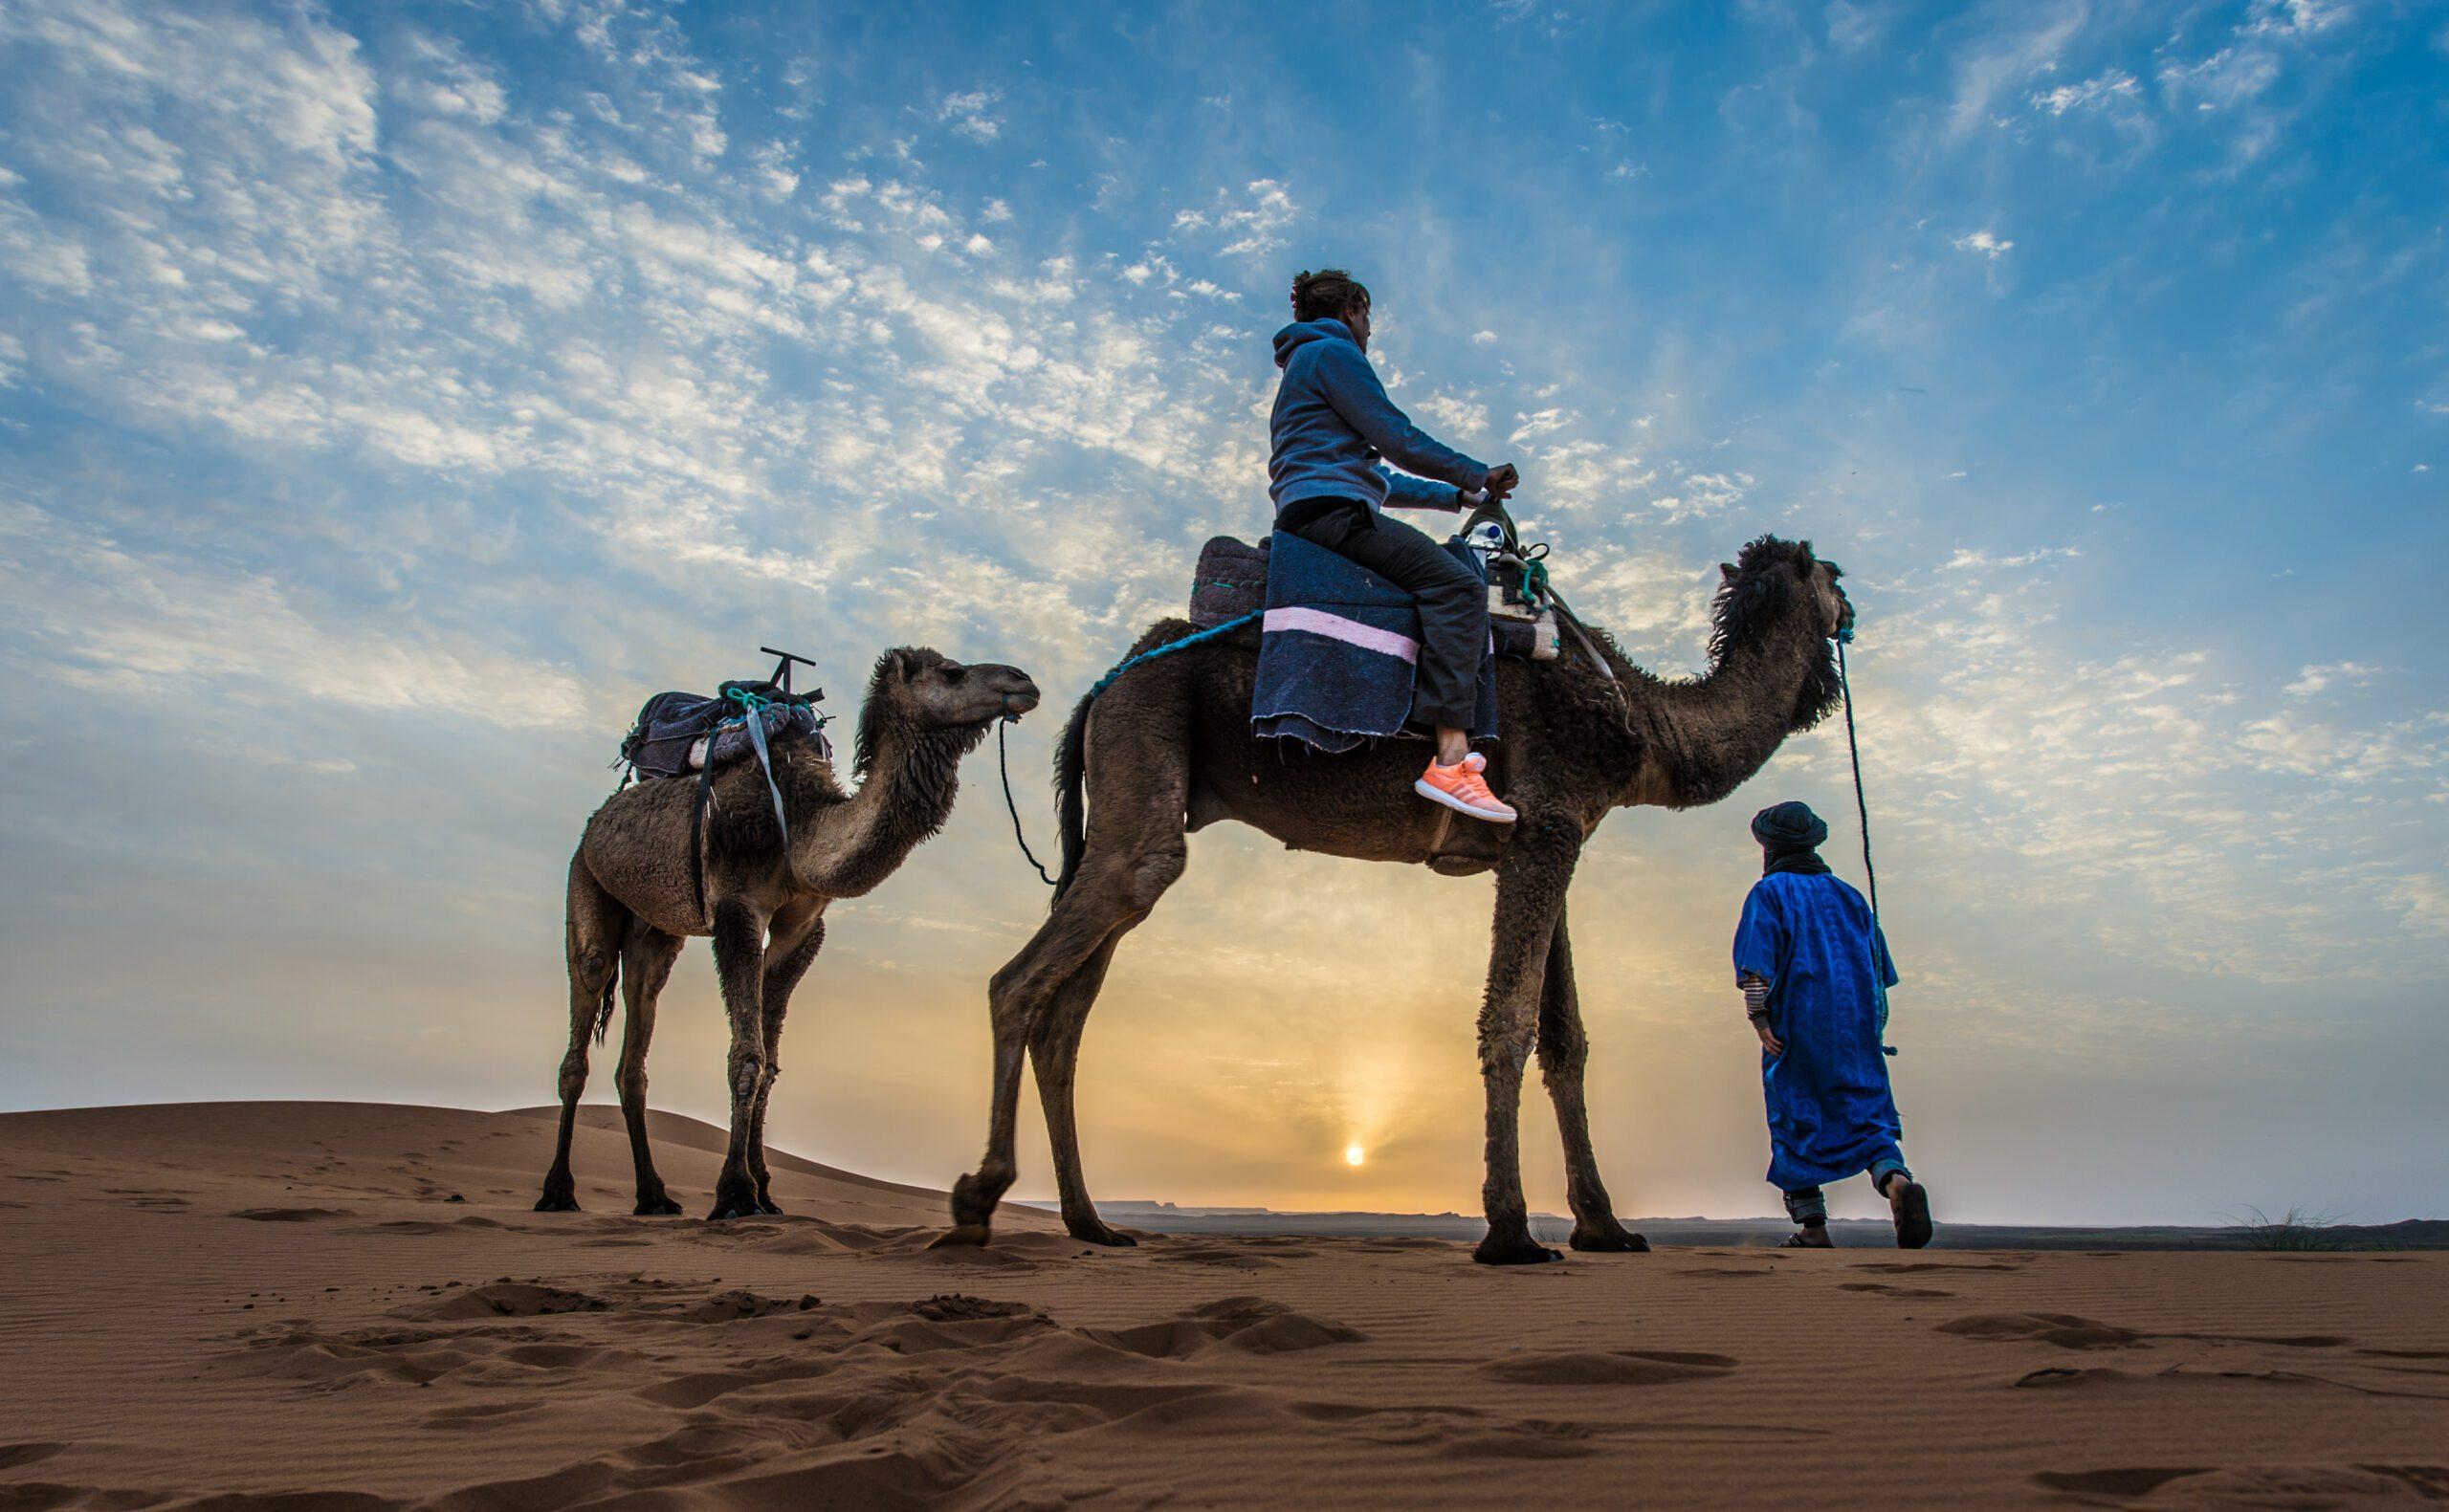 Gold Sand Camp, Moroccan Sahara